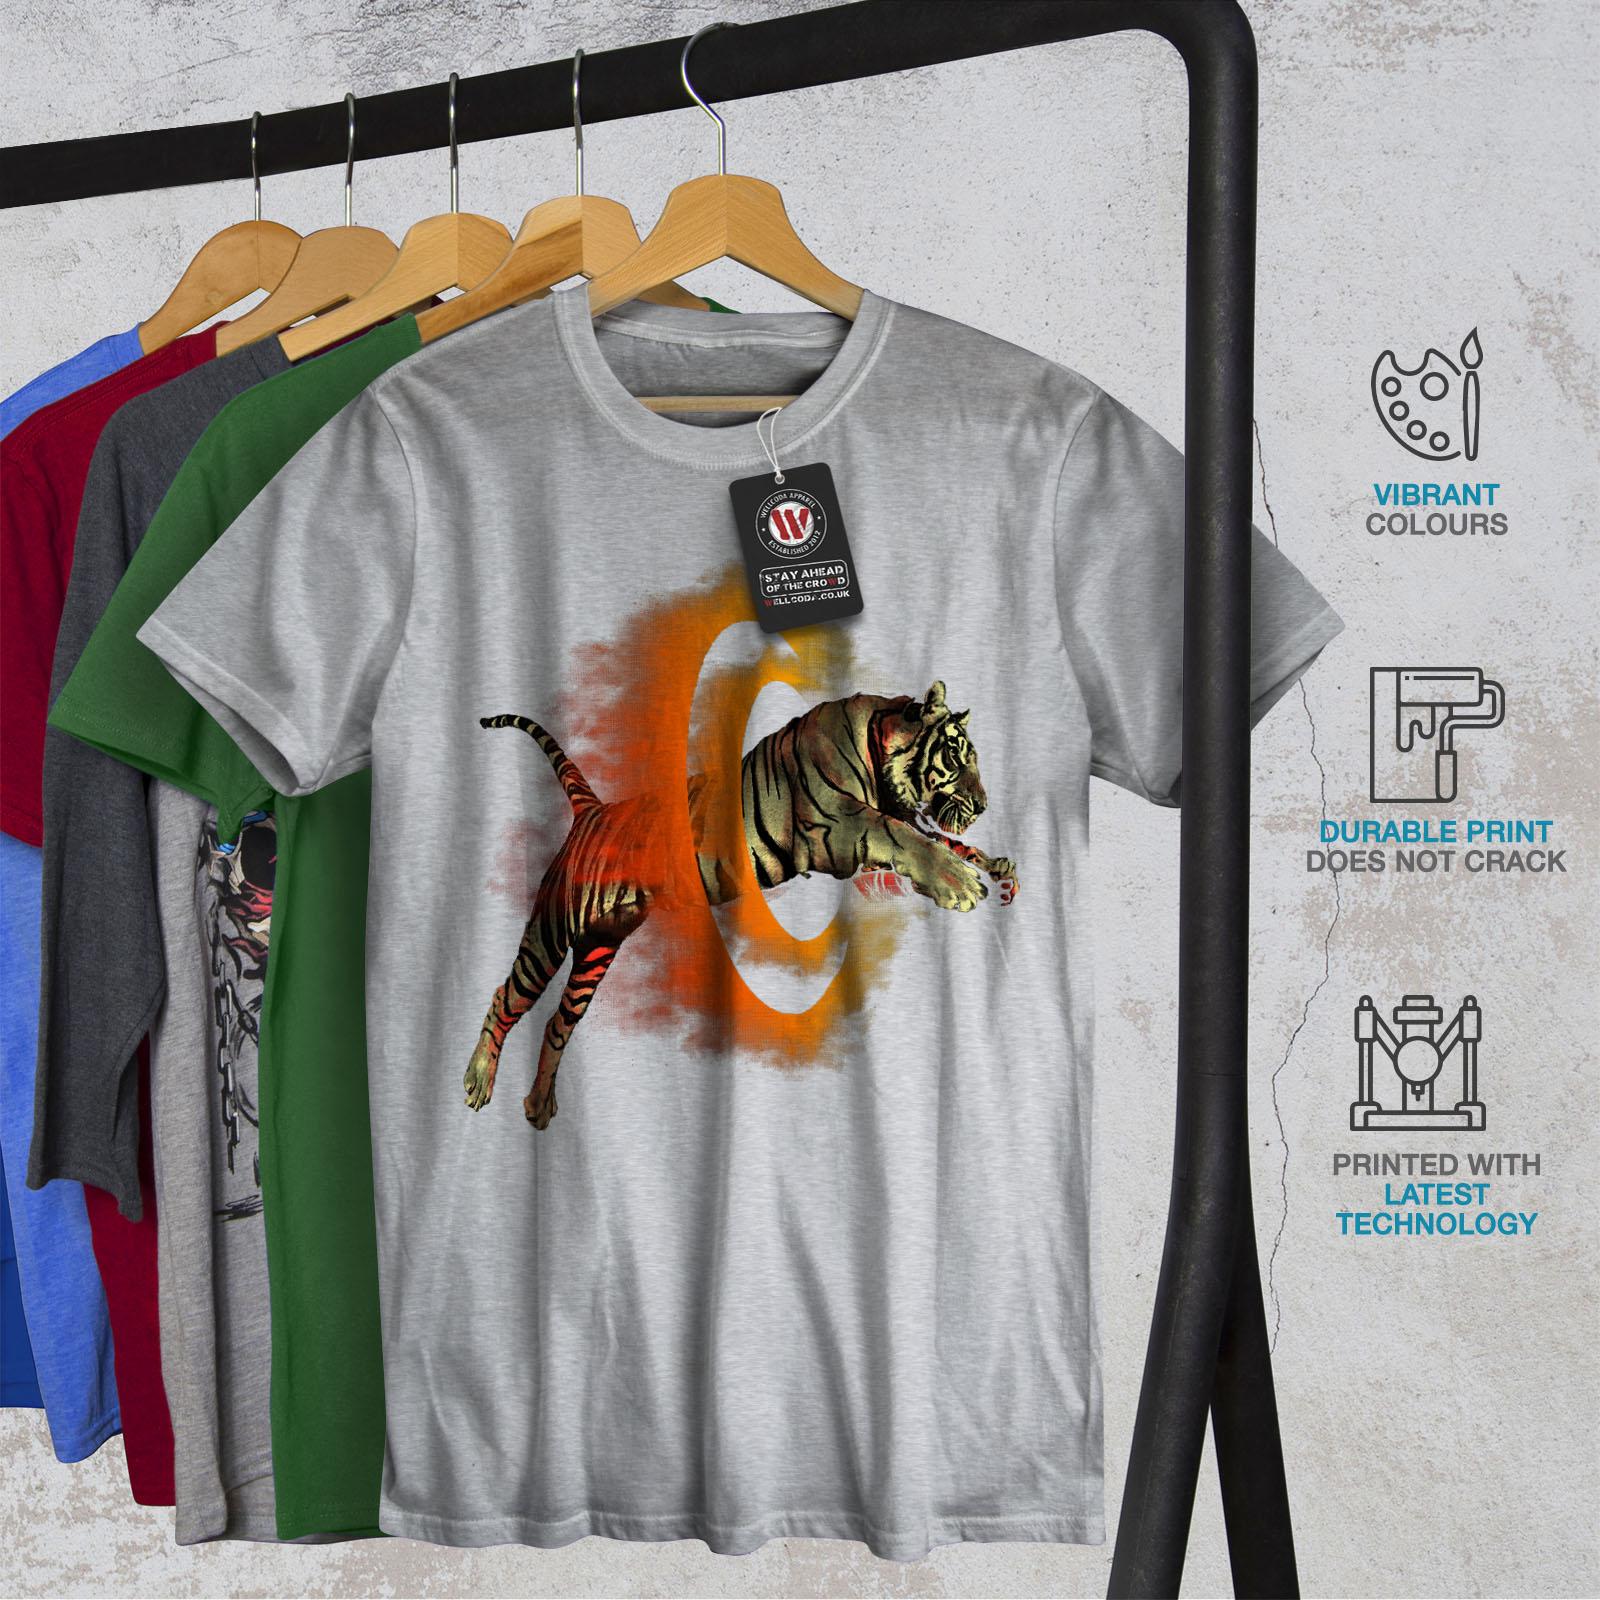 Wellcoda-Tiger-Portal-Cool-Mens-T-shirt-Flame-Graphic-Design-Printed-Tee thumbnail 18